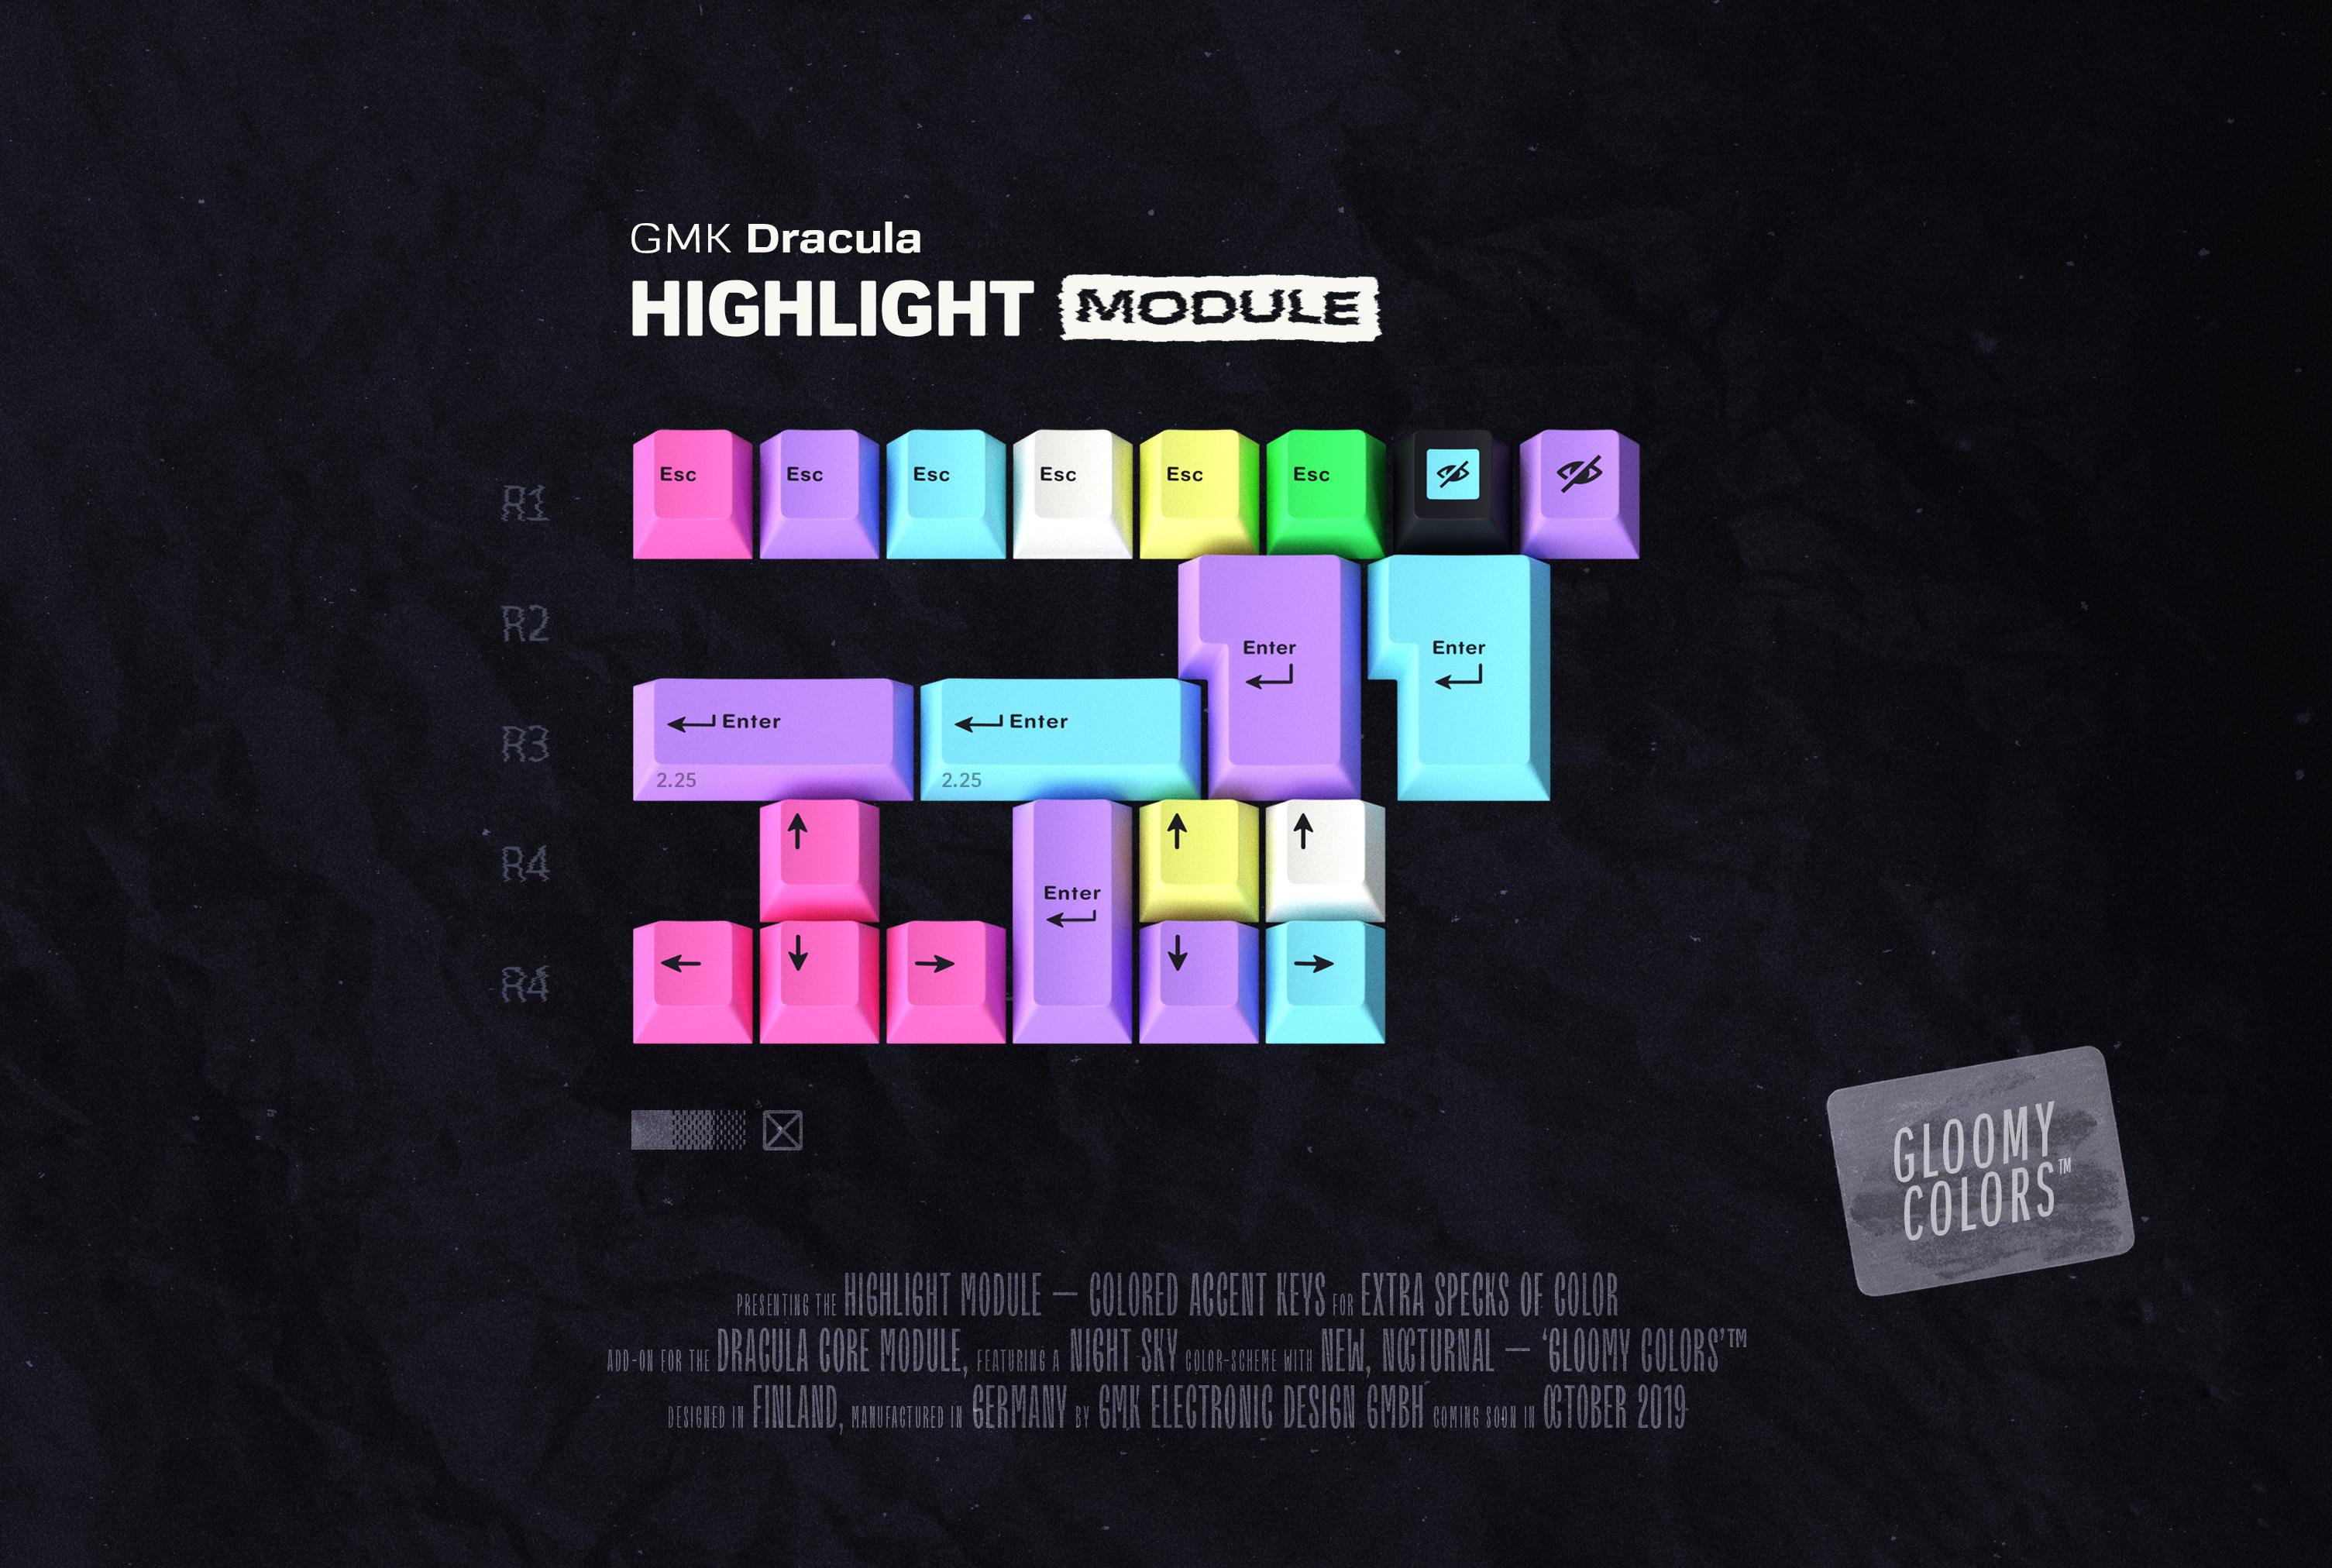 Highlight Module